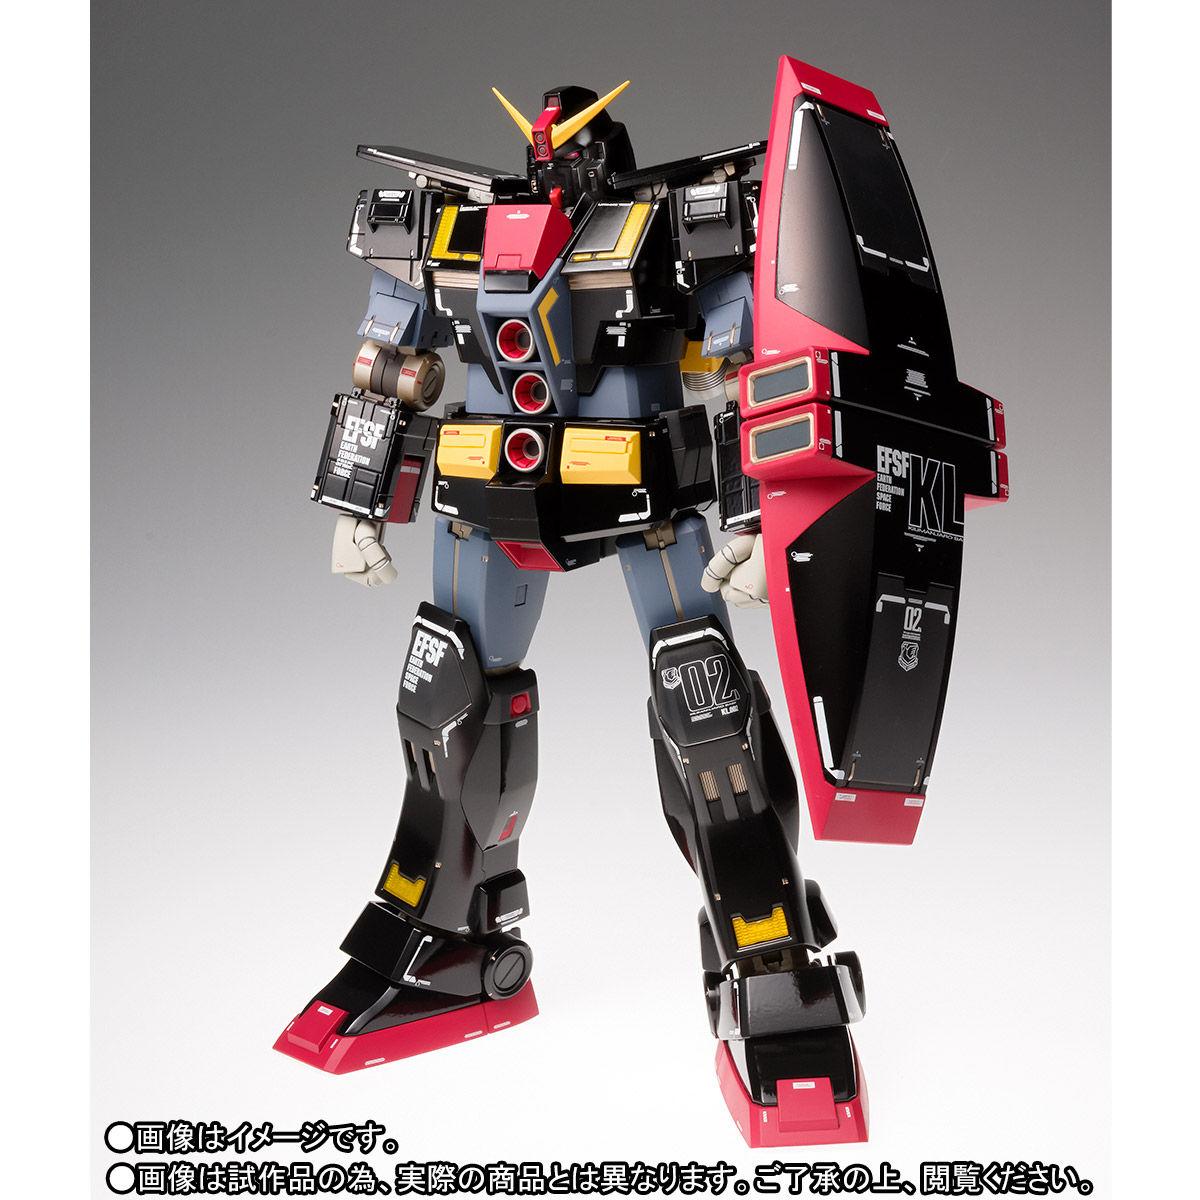 FIX FIGURATION METAL COMPOSITE『サイコ・ガンダム(グロスカラーVer.)』機動戦士Zガンダム アクションフィギュア-002